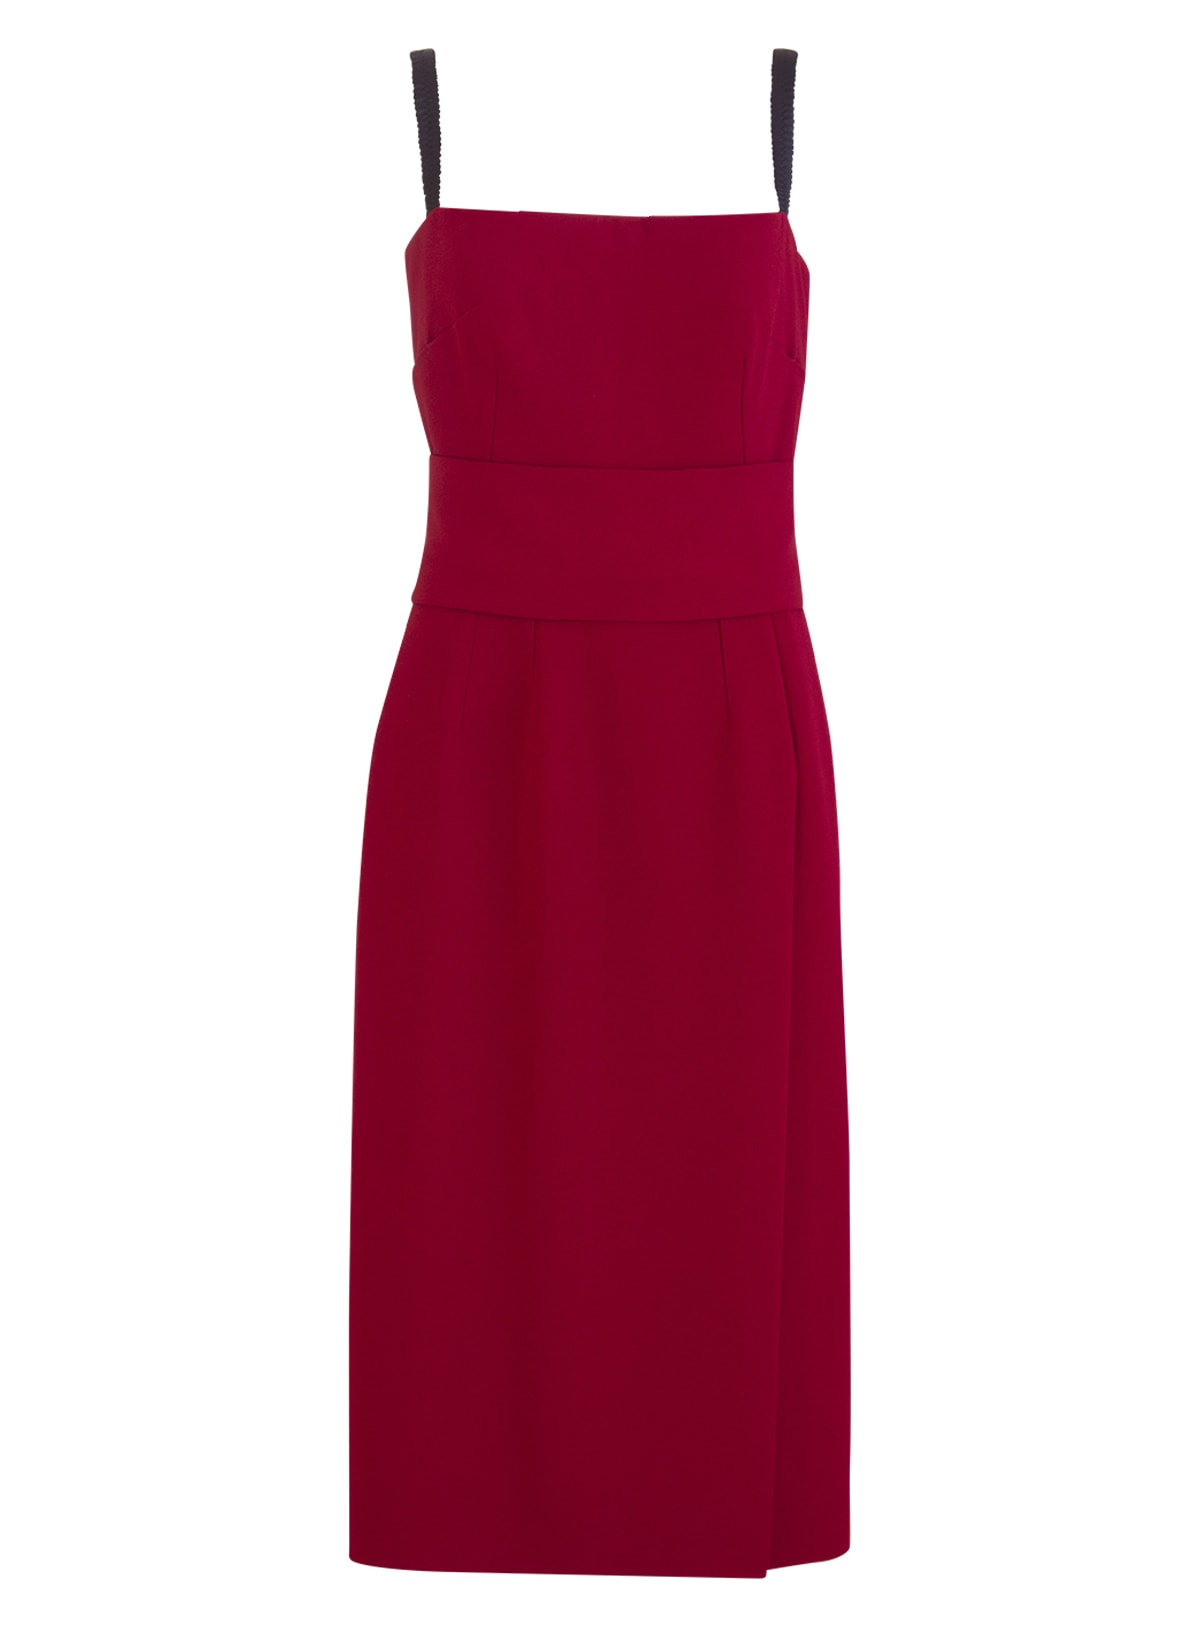 Buy Dolce & Gabbana Cady Longuette Dress online, shop Dolce & Gabbana with free shipping